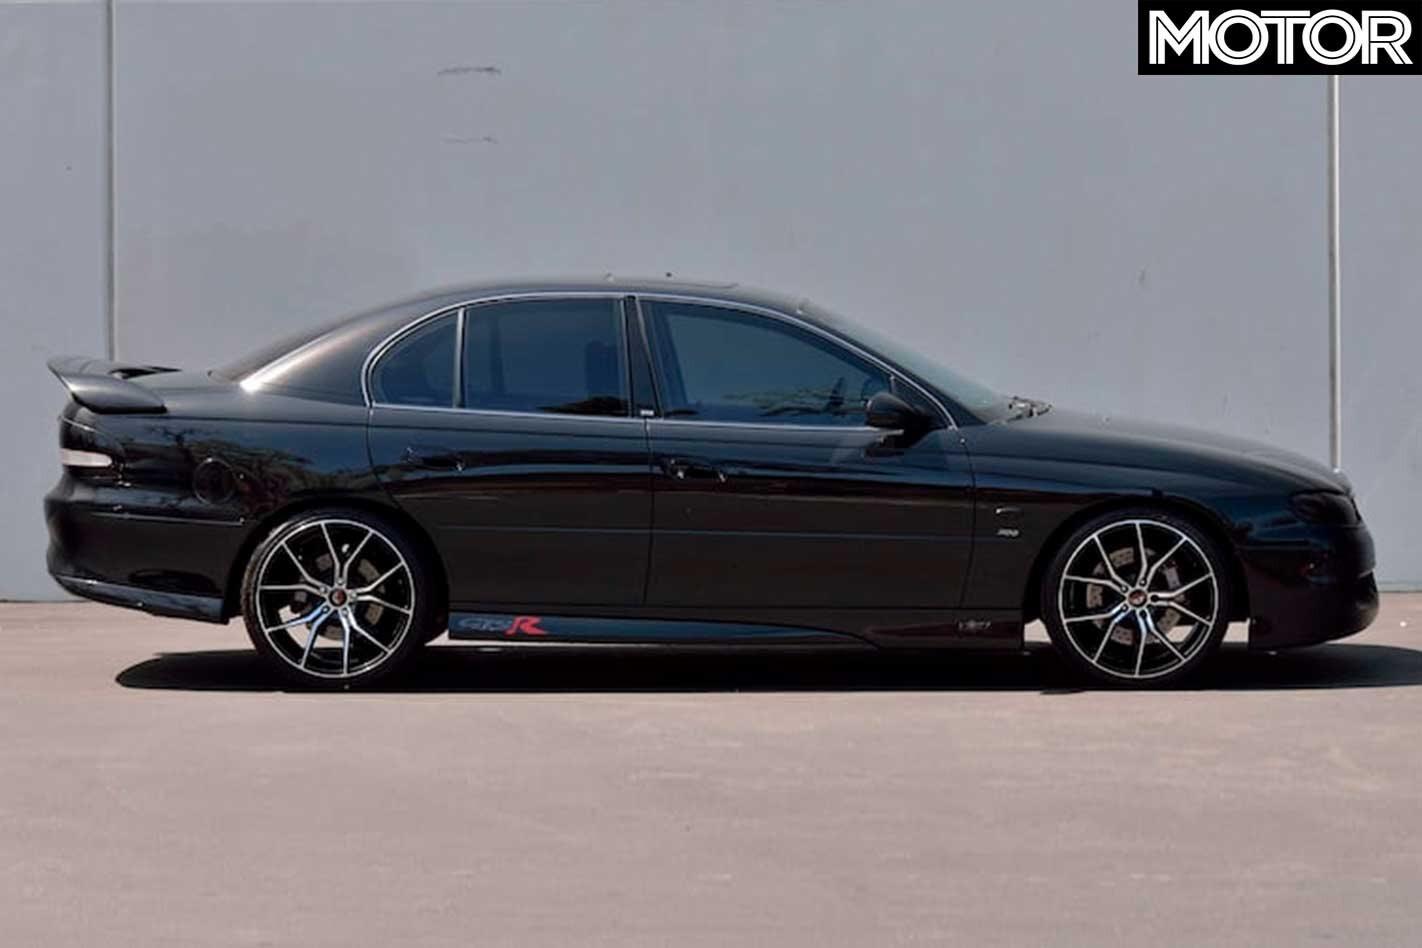 2000 HSV VTII GTSR side